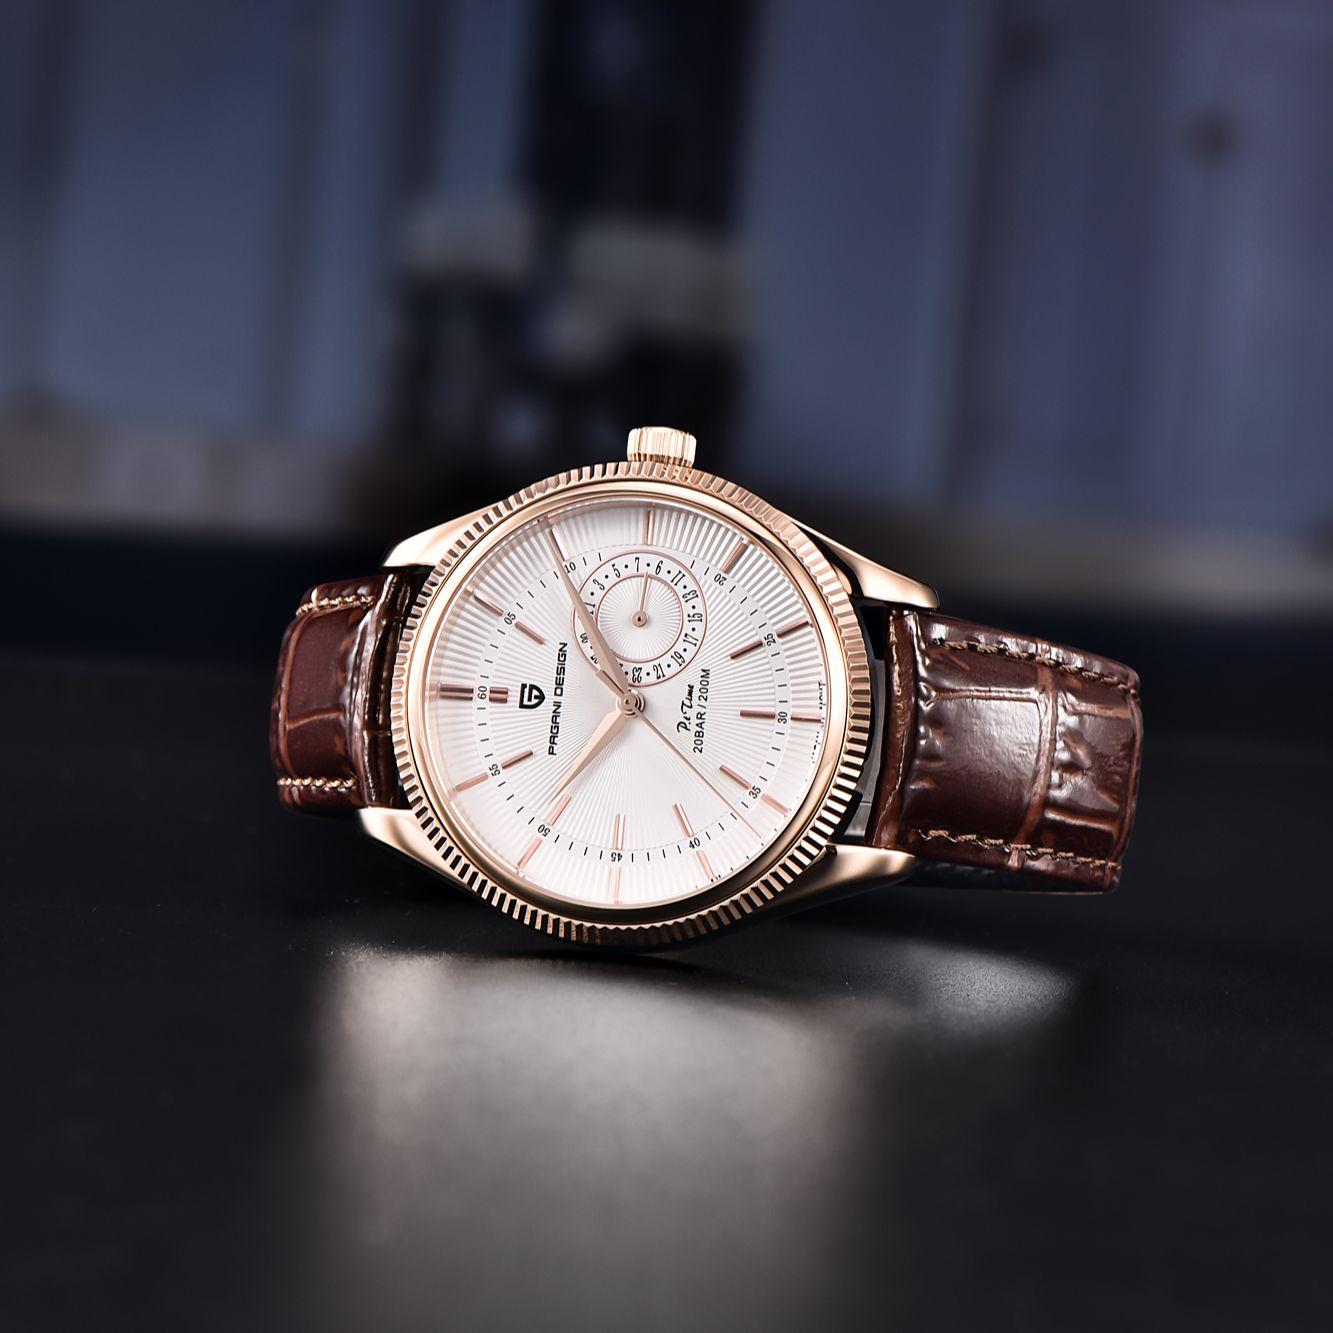 Pagani Design 2021 Top Brand Watch Men's Leather Quartz Watch Stainless Steel 200m Waterproof Clock Luxury Watch Reloj Hombre enlarge